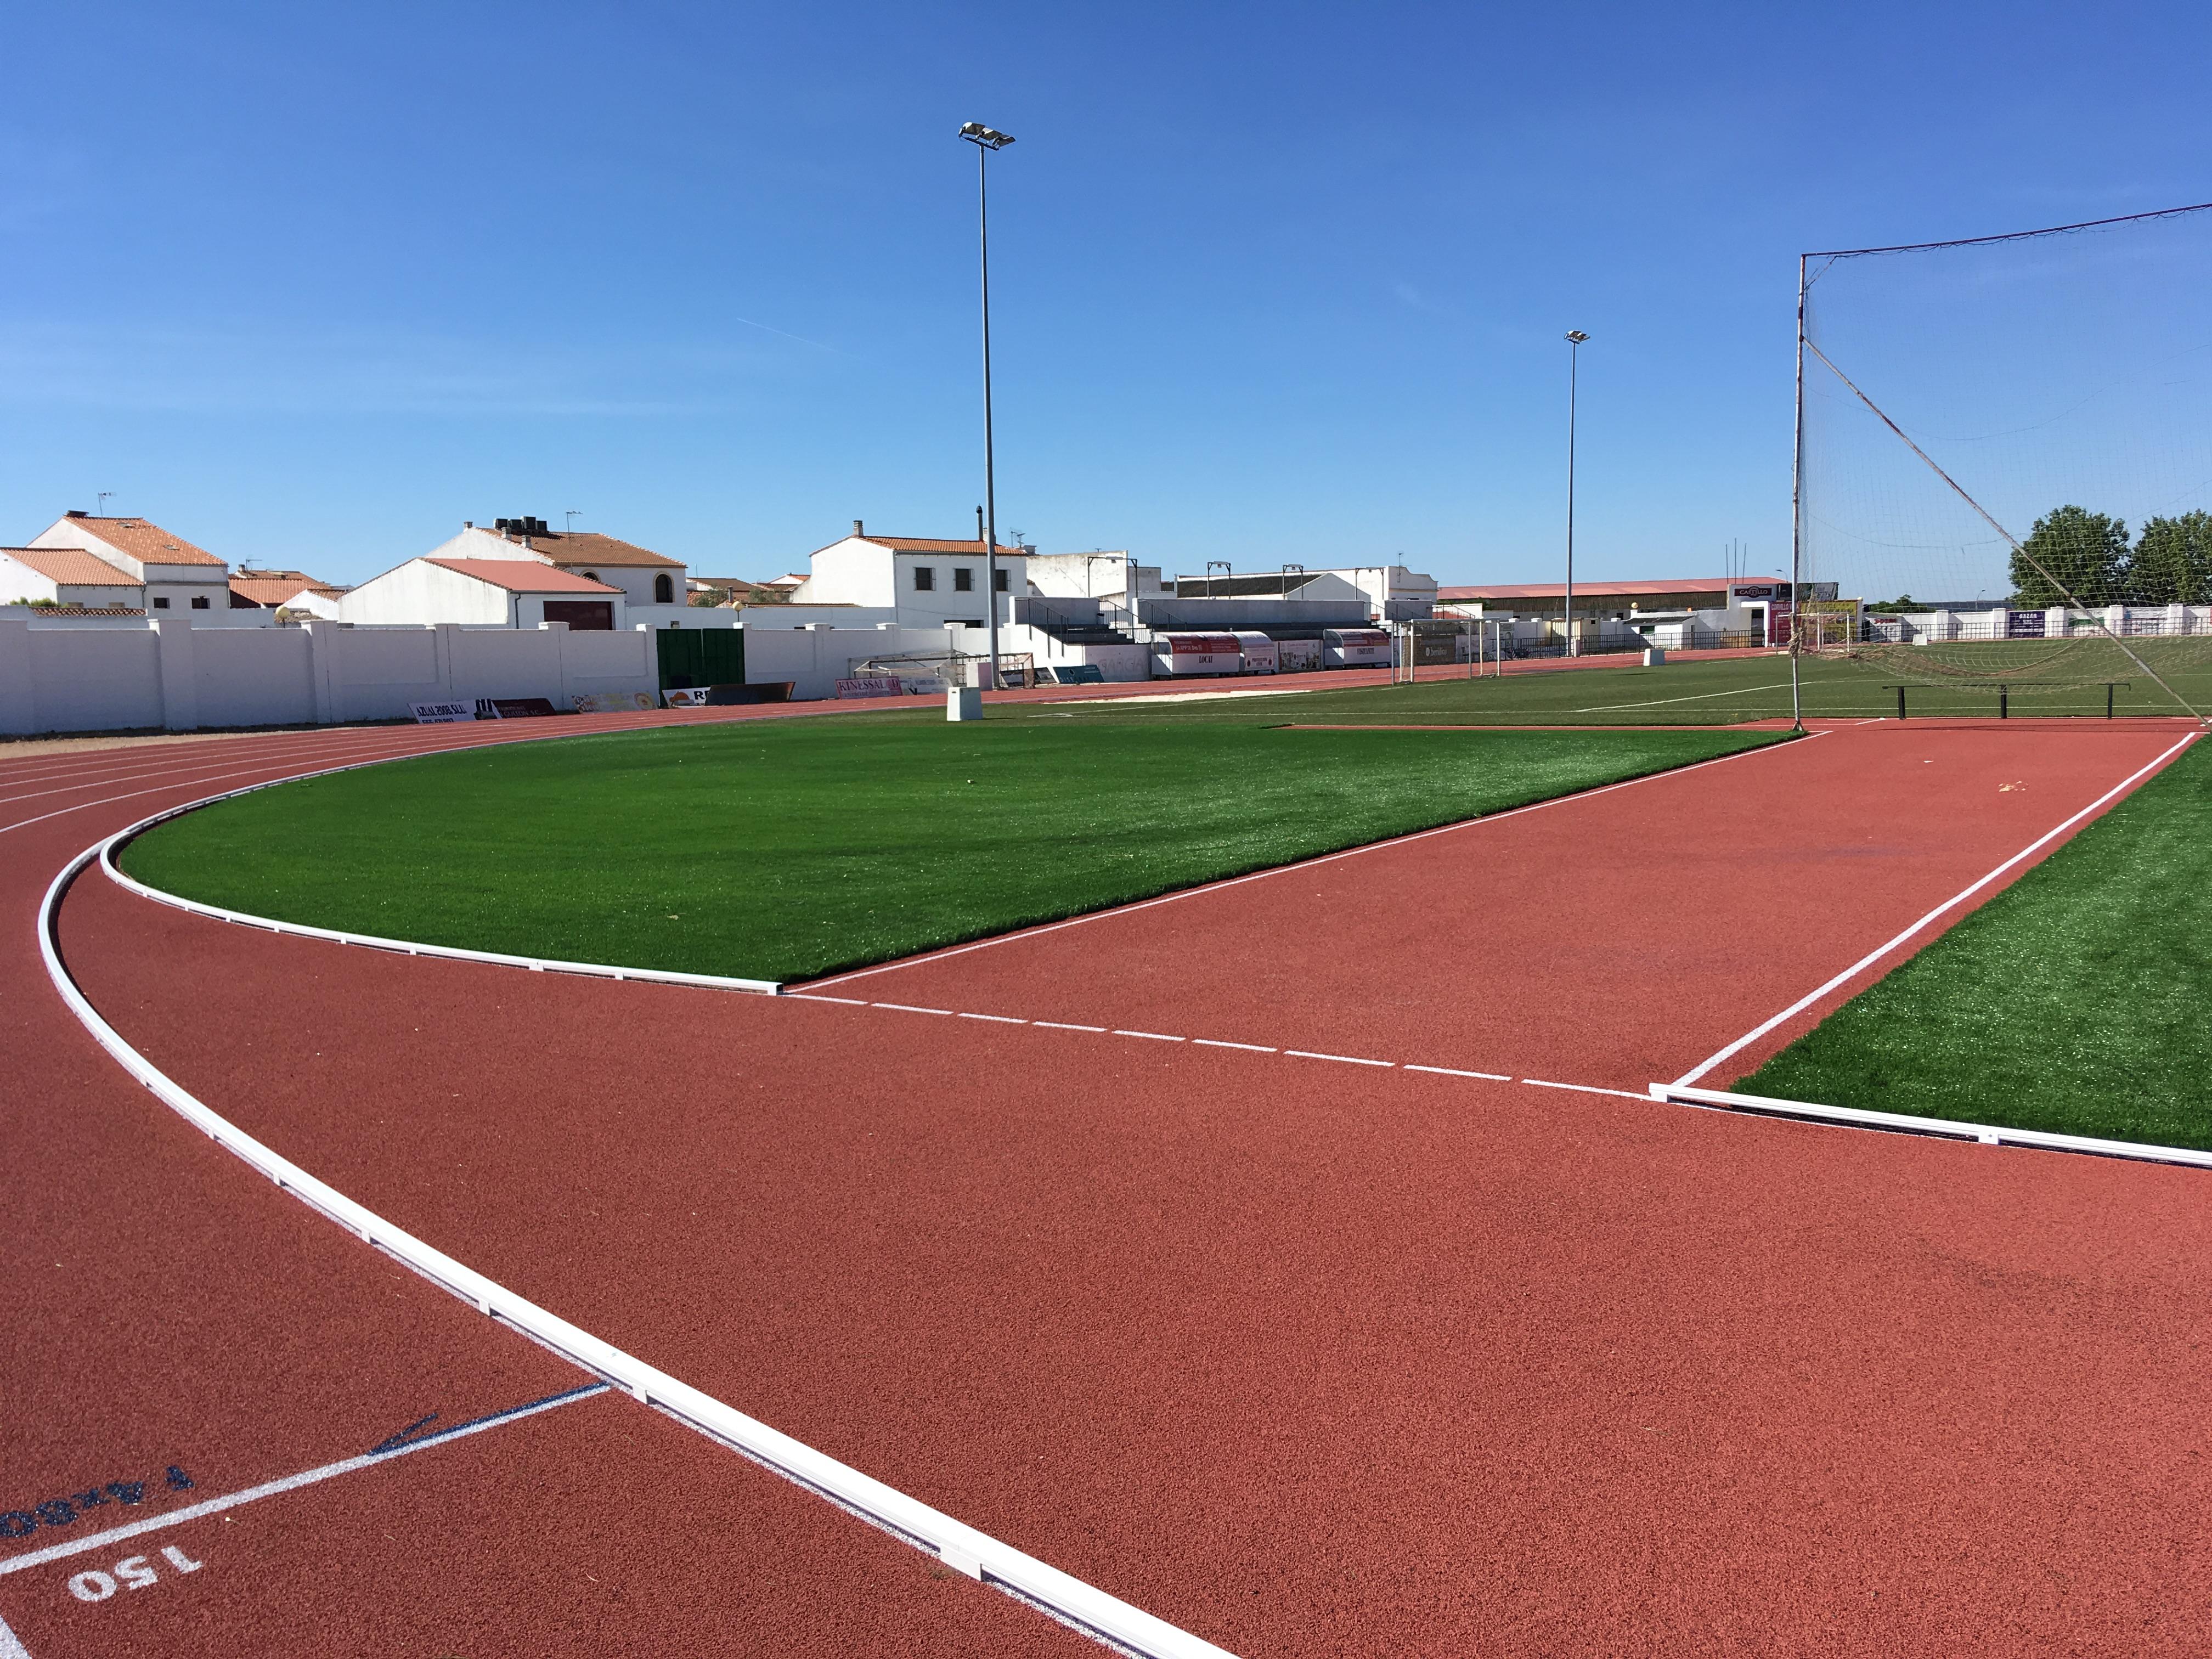 Estadio Municipal de Deportes de Azuaga, Badajoz Image